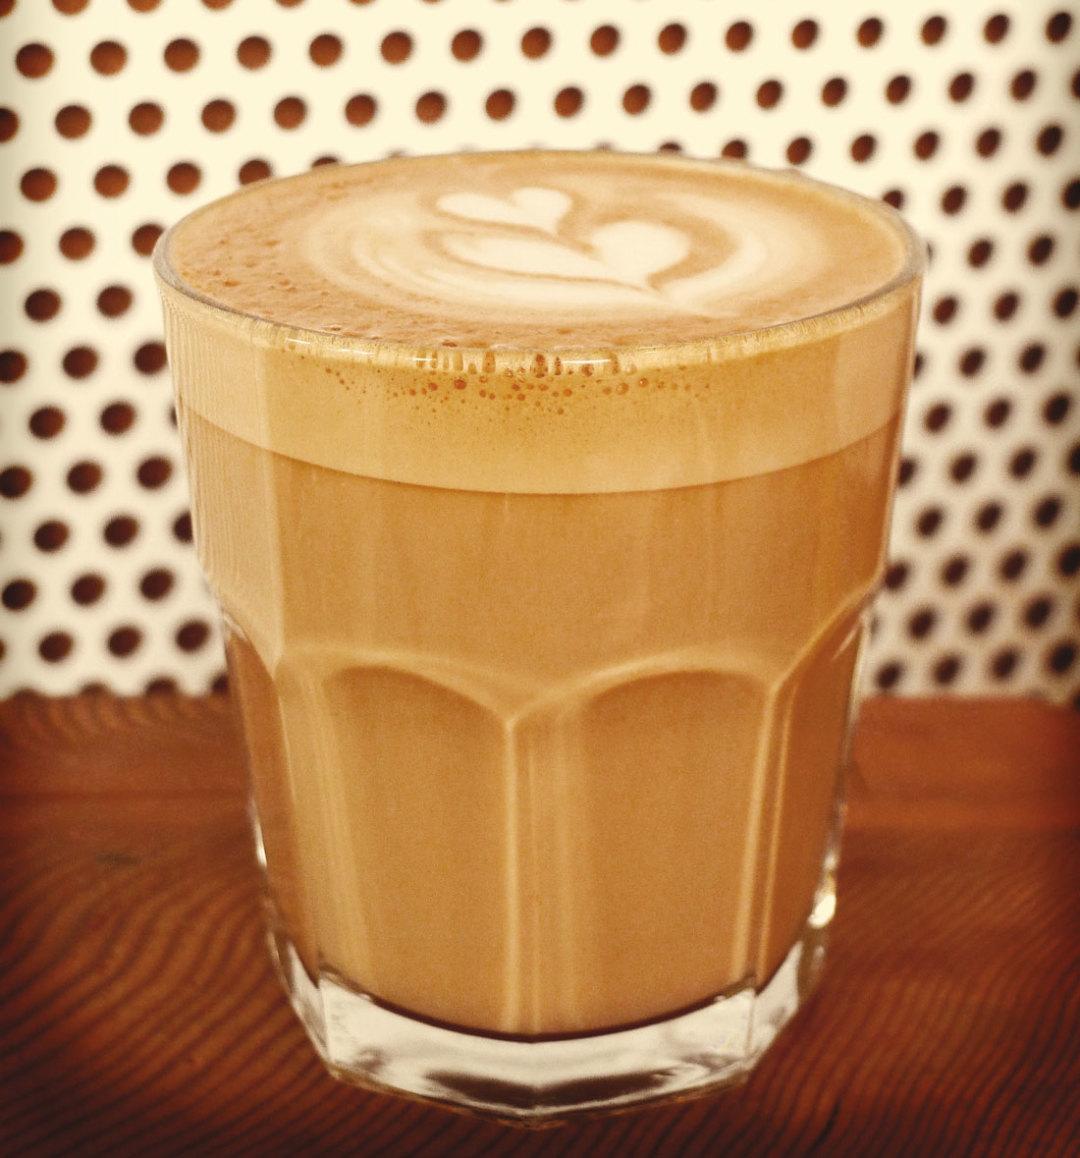 0116 goodcoffee 02 auwk0t